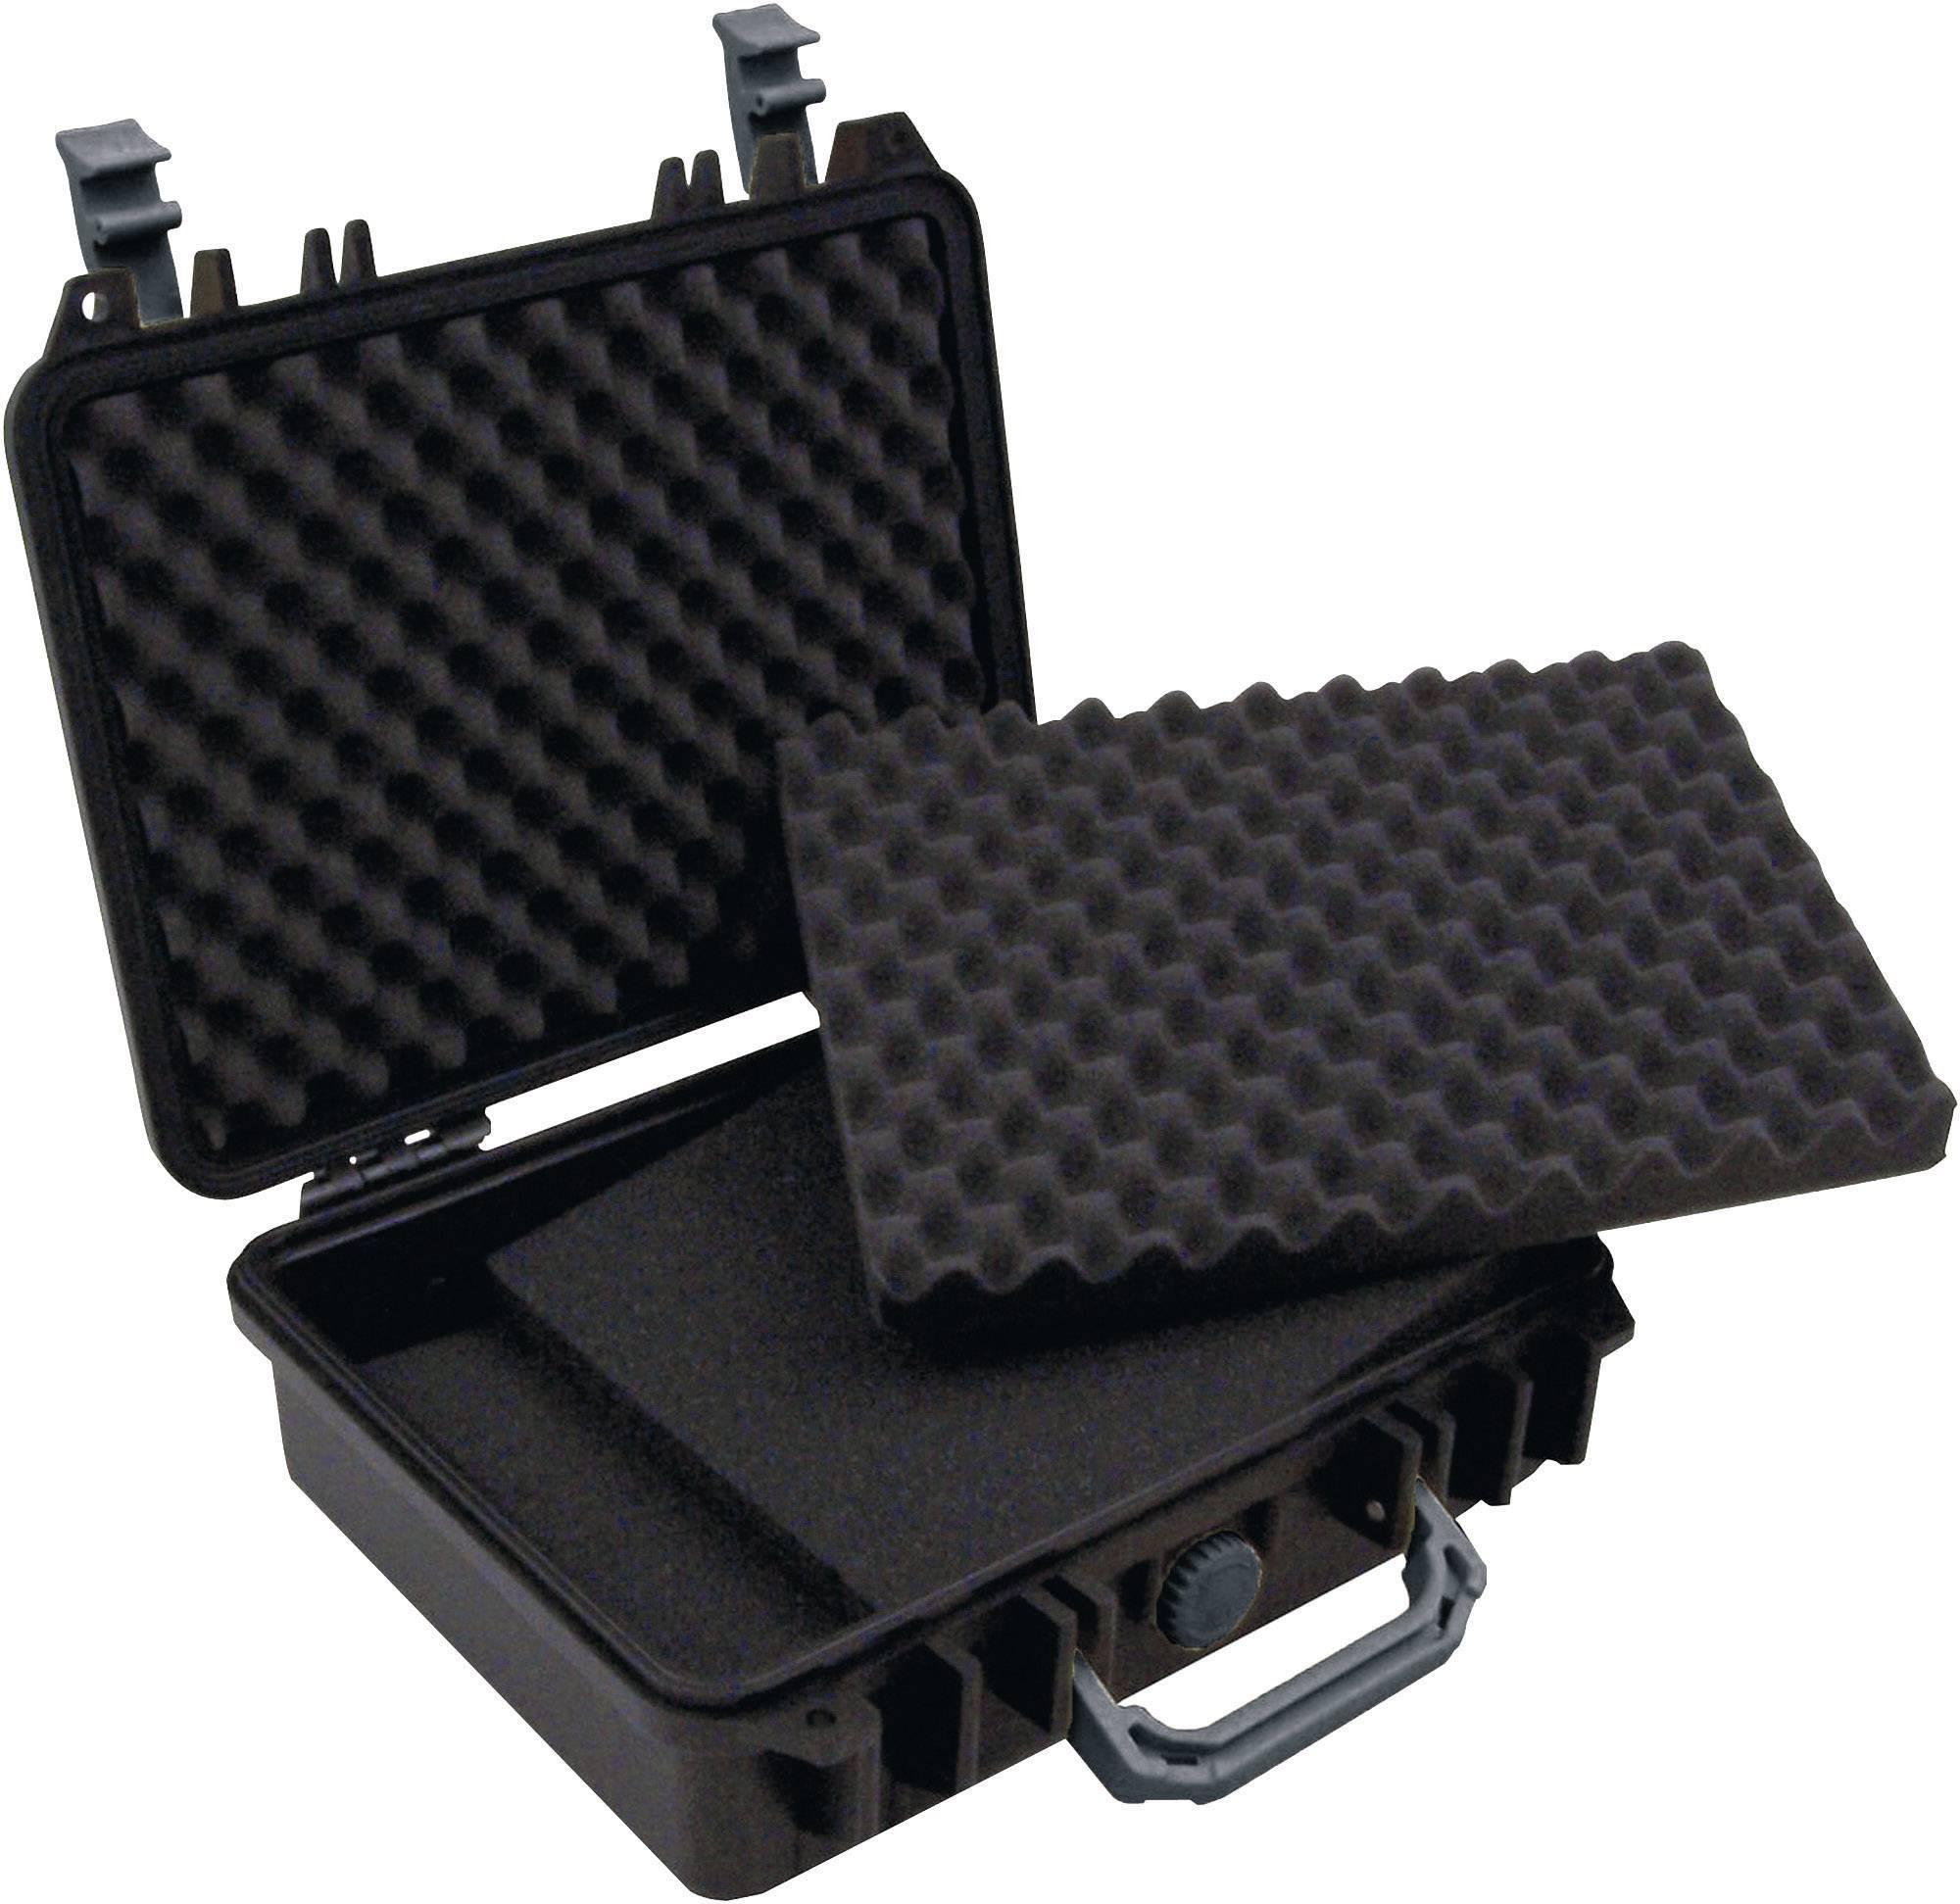 Outdoorový kufor Viso WAT330, 330 x 280 x 120 mm